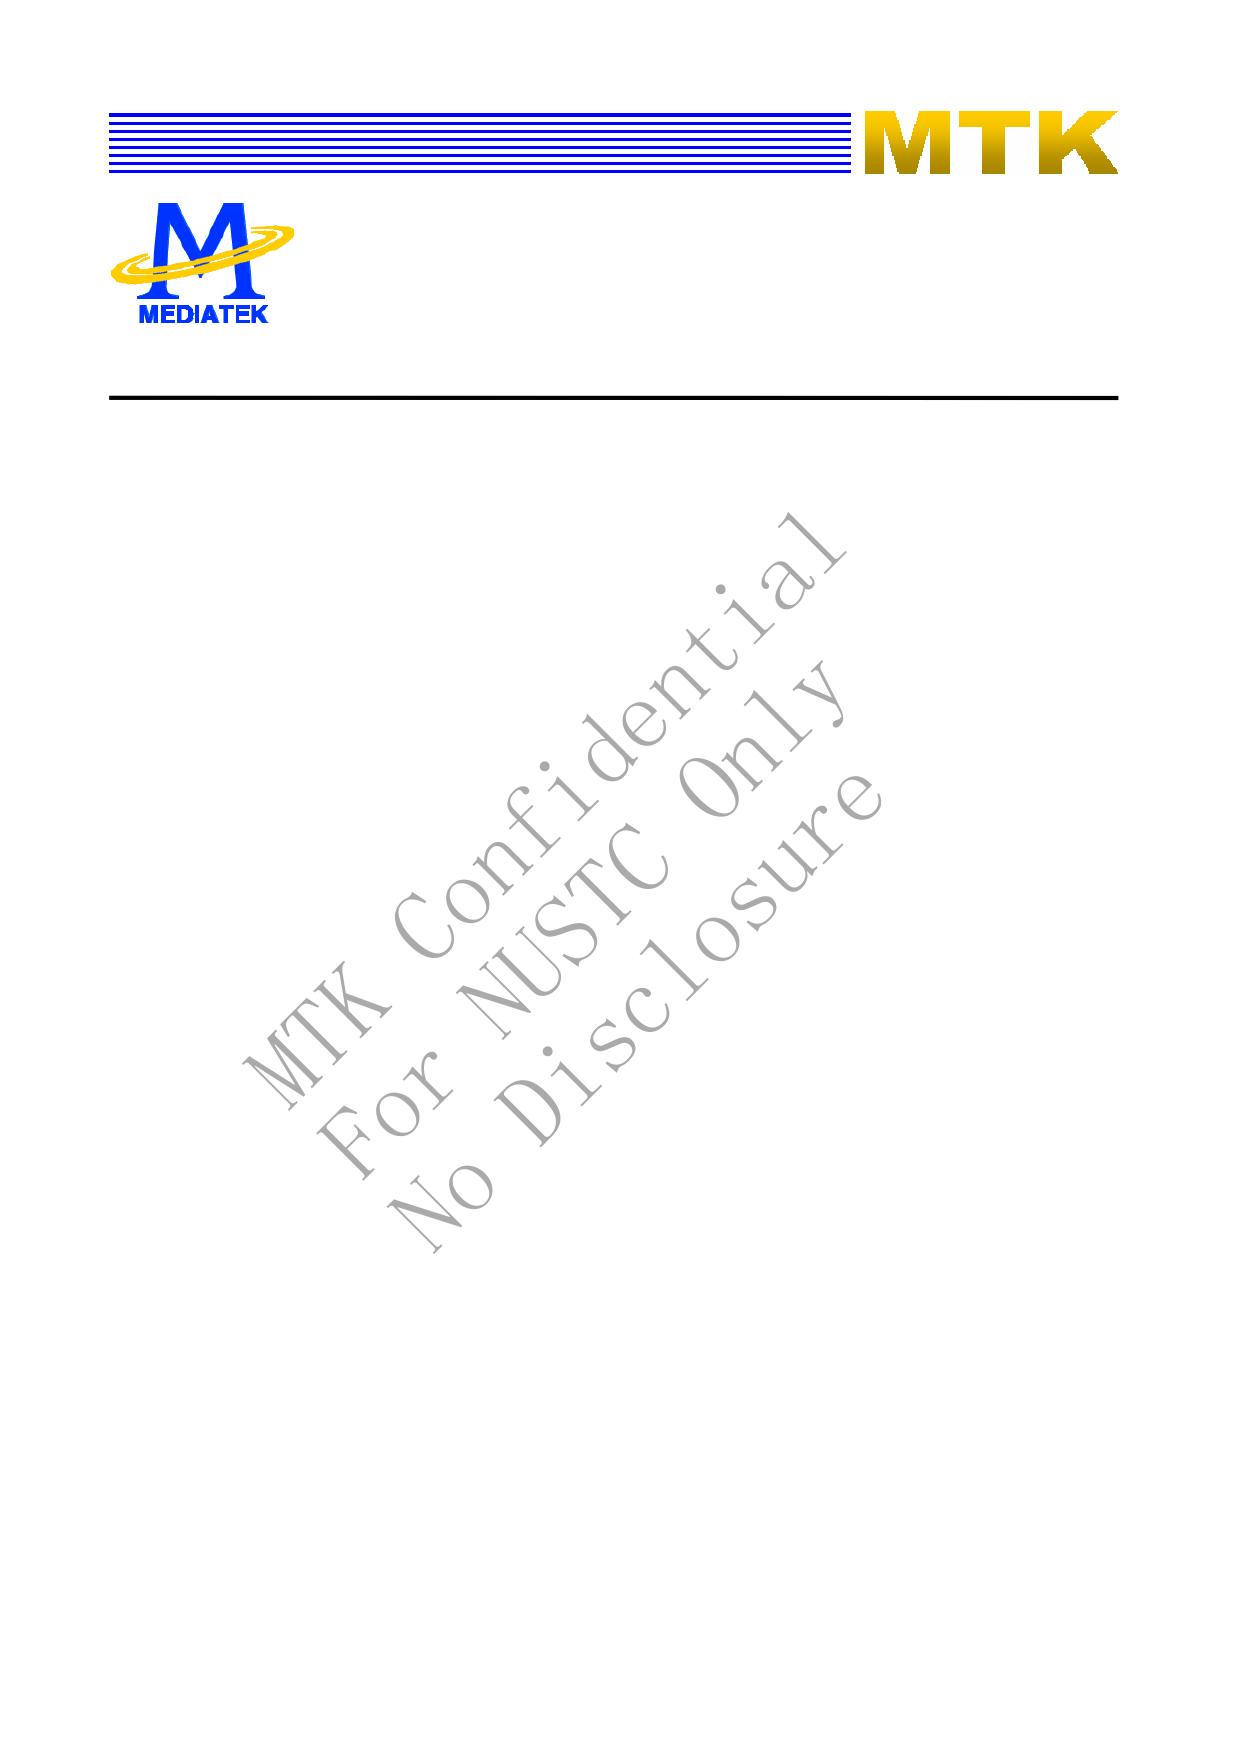 MT8292 pdf, 반도체, 판매, 대치품